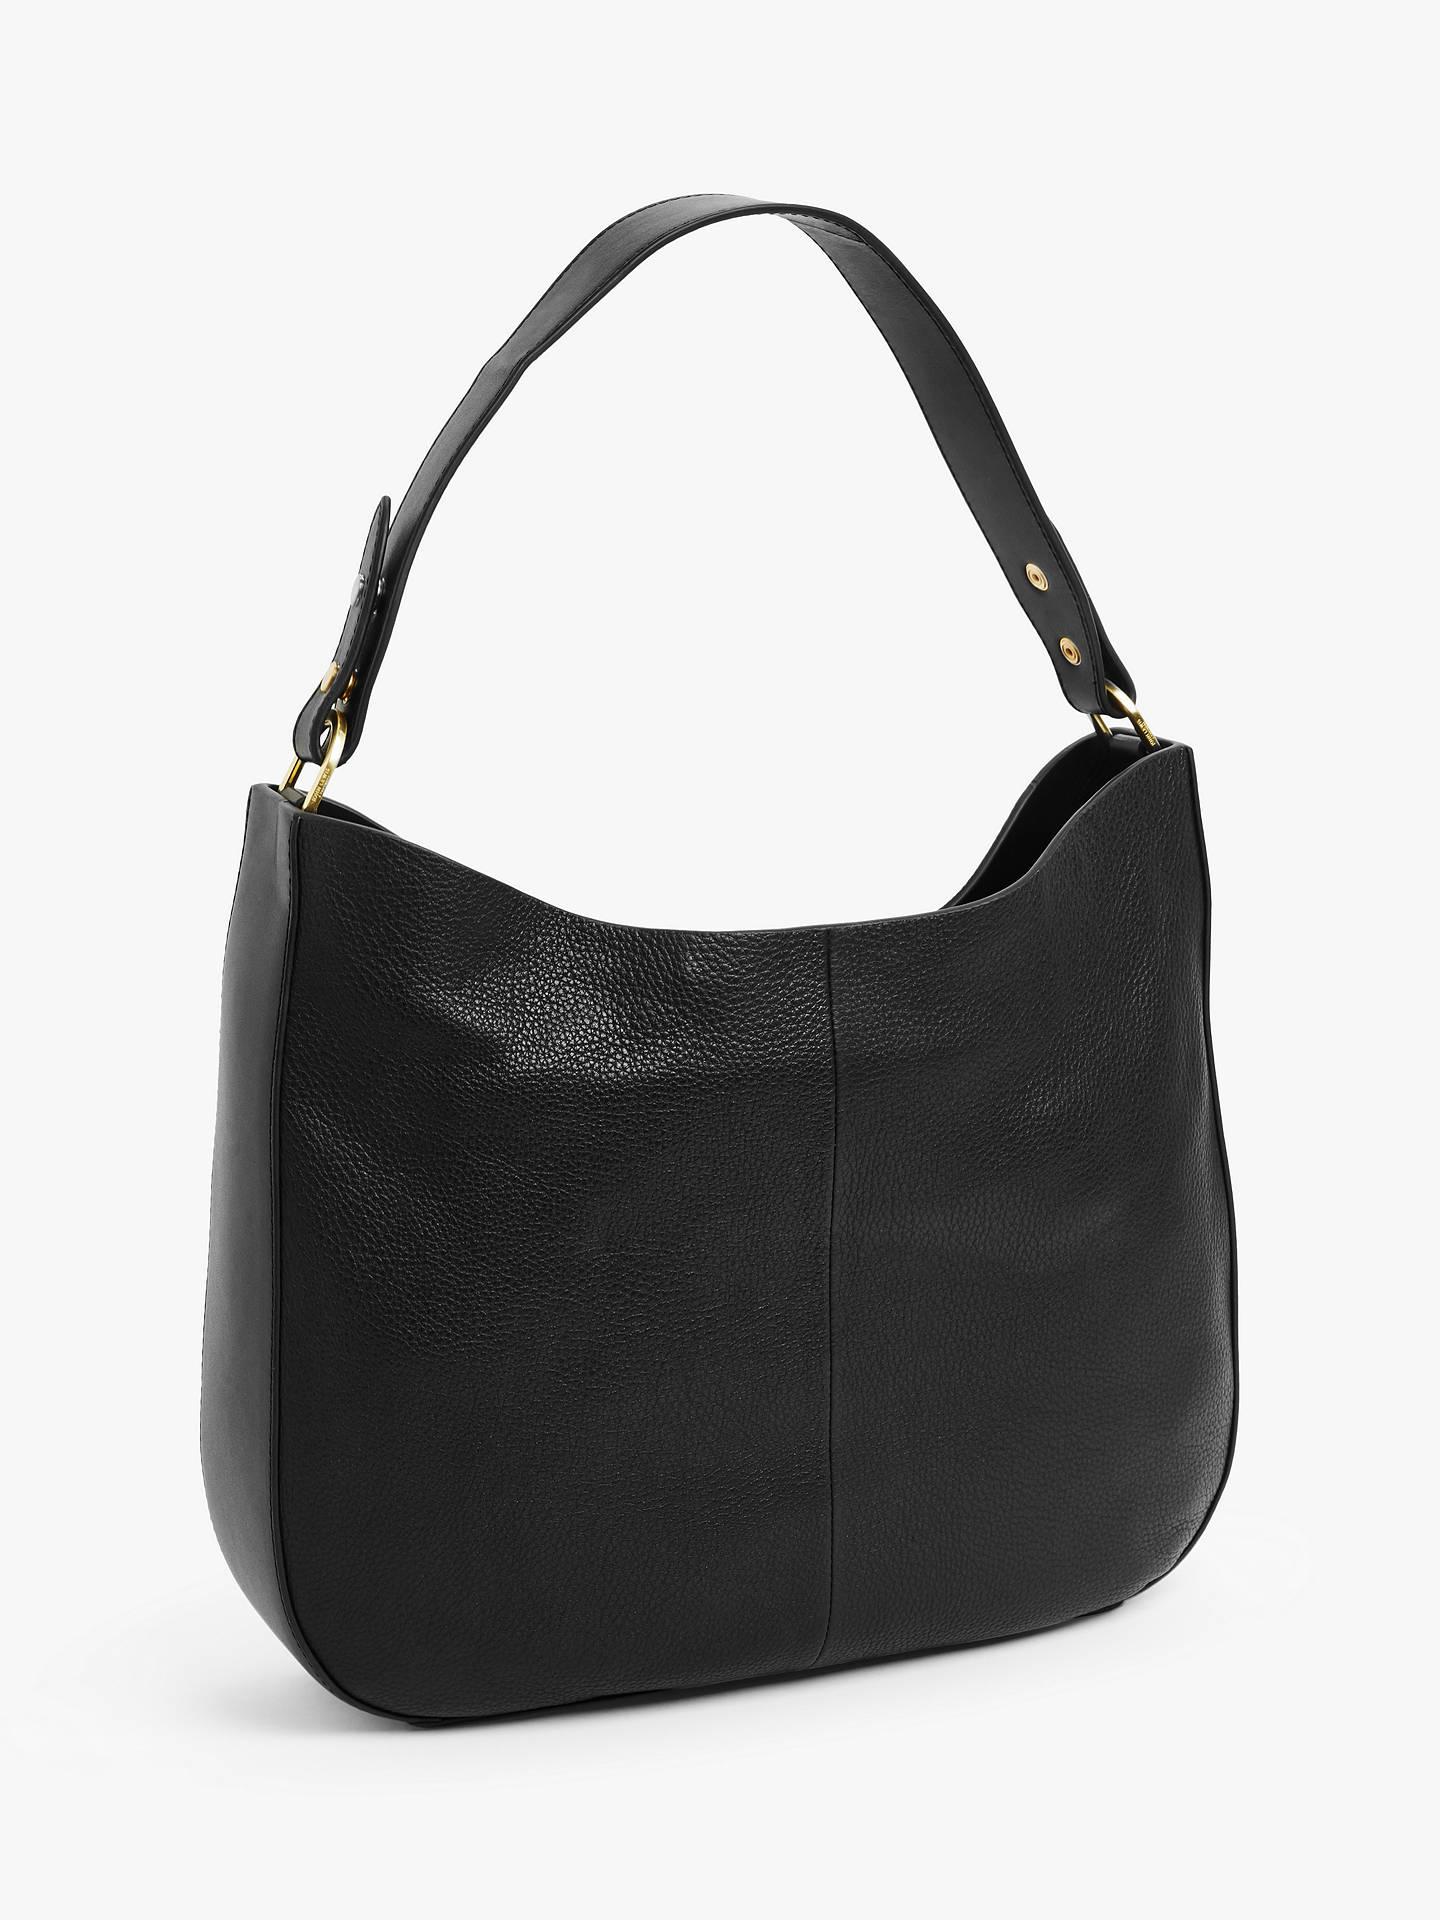 67688bc22755 ... Buy John Lewis & Partners Freya Leather Hobo Bag, Black Online at  johnlewis. ...